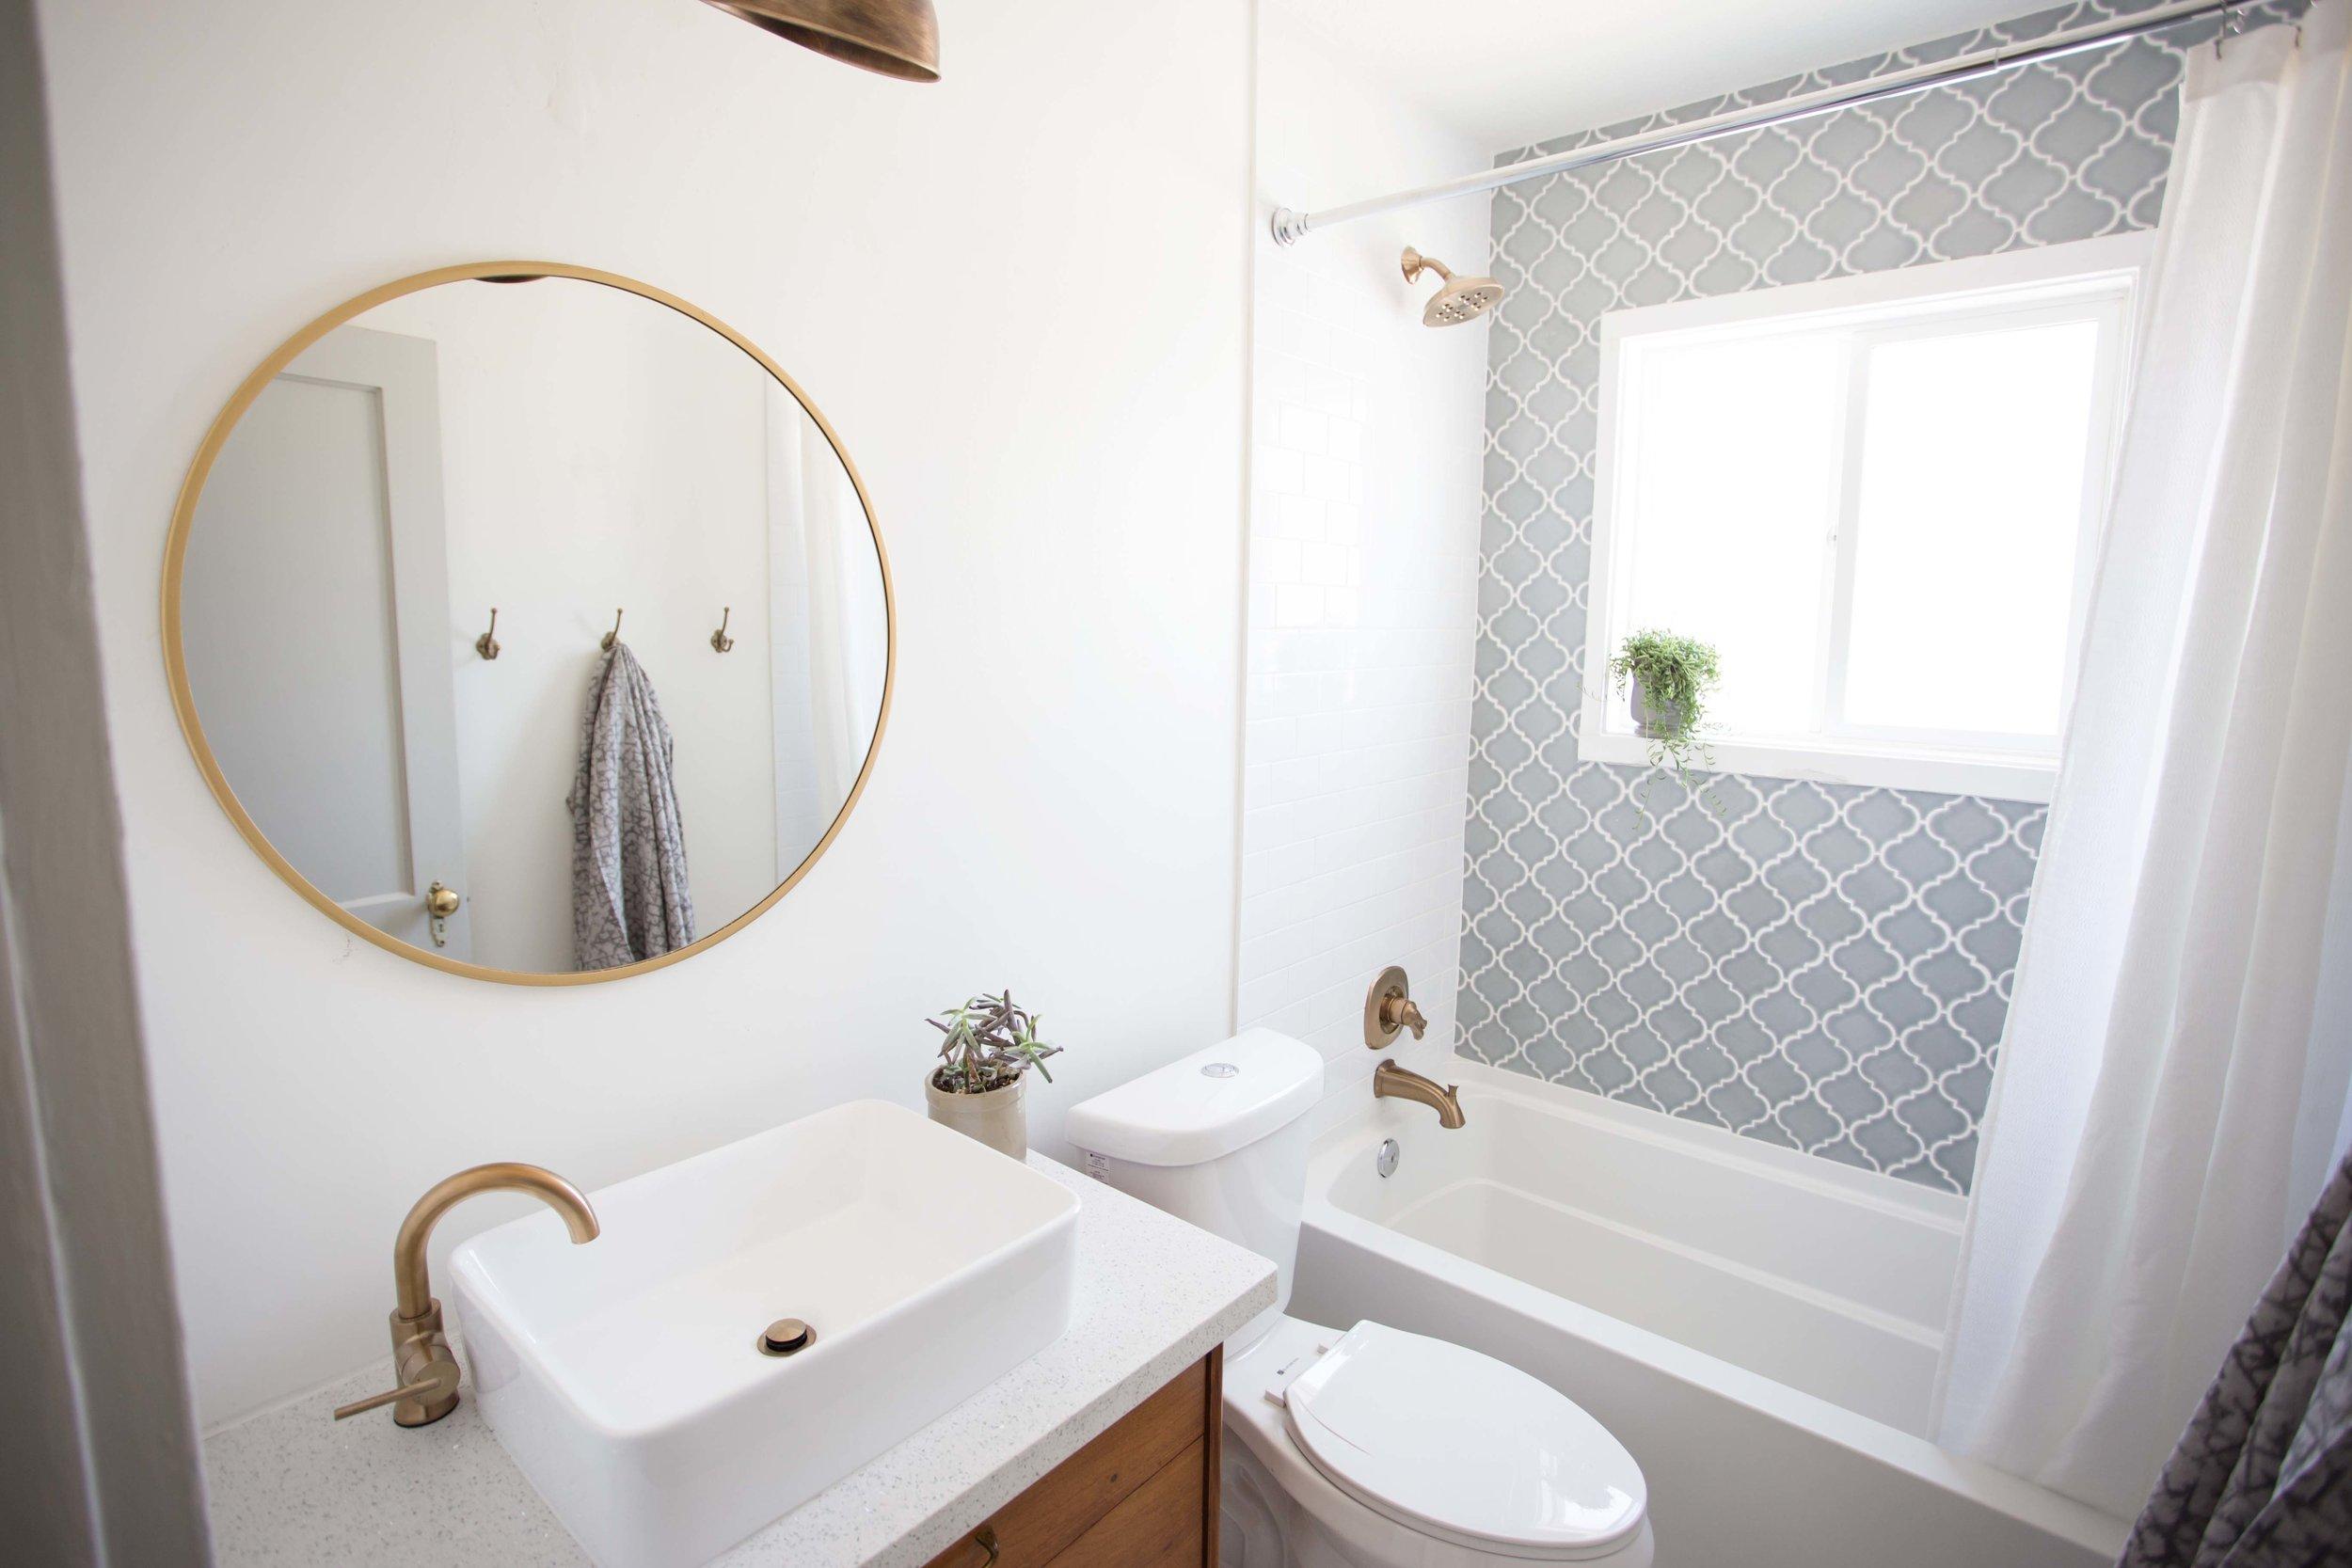 Almeria Spanish Modern Style Bathroom GET THE LOOK